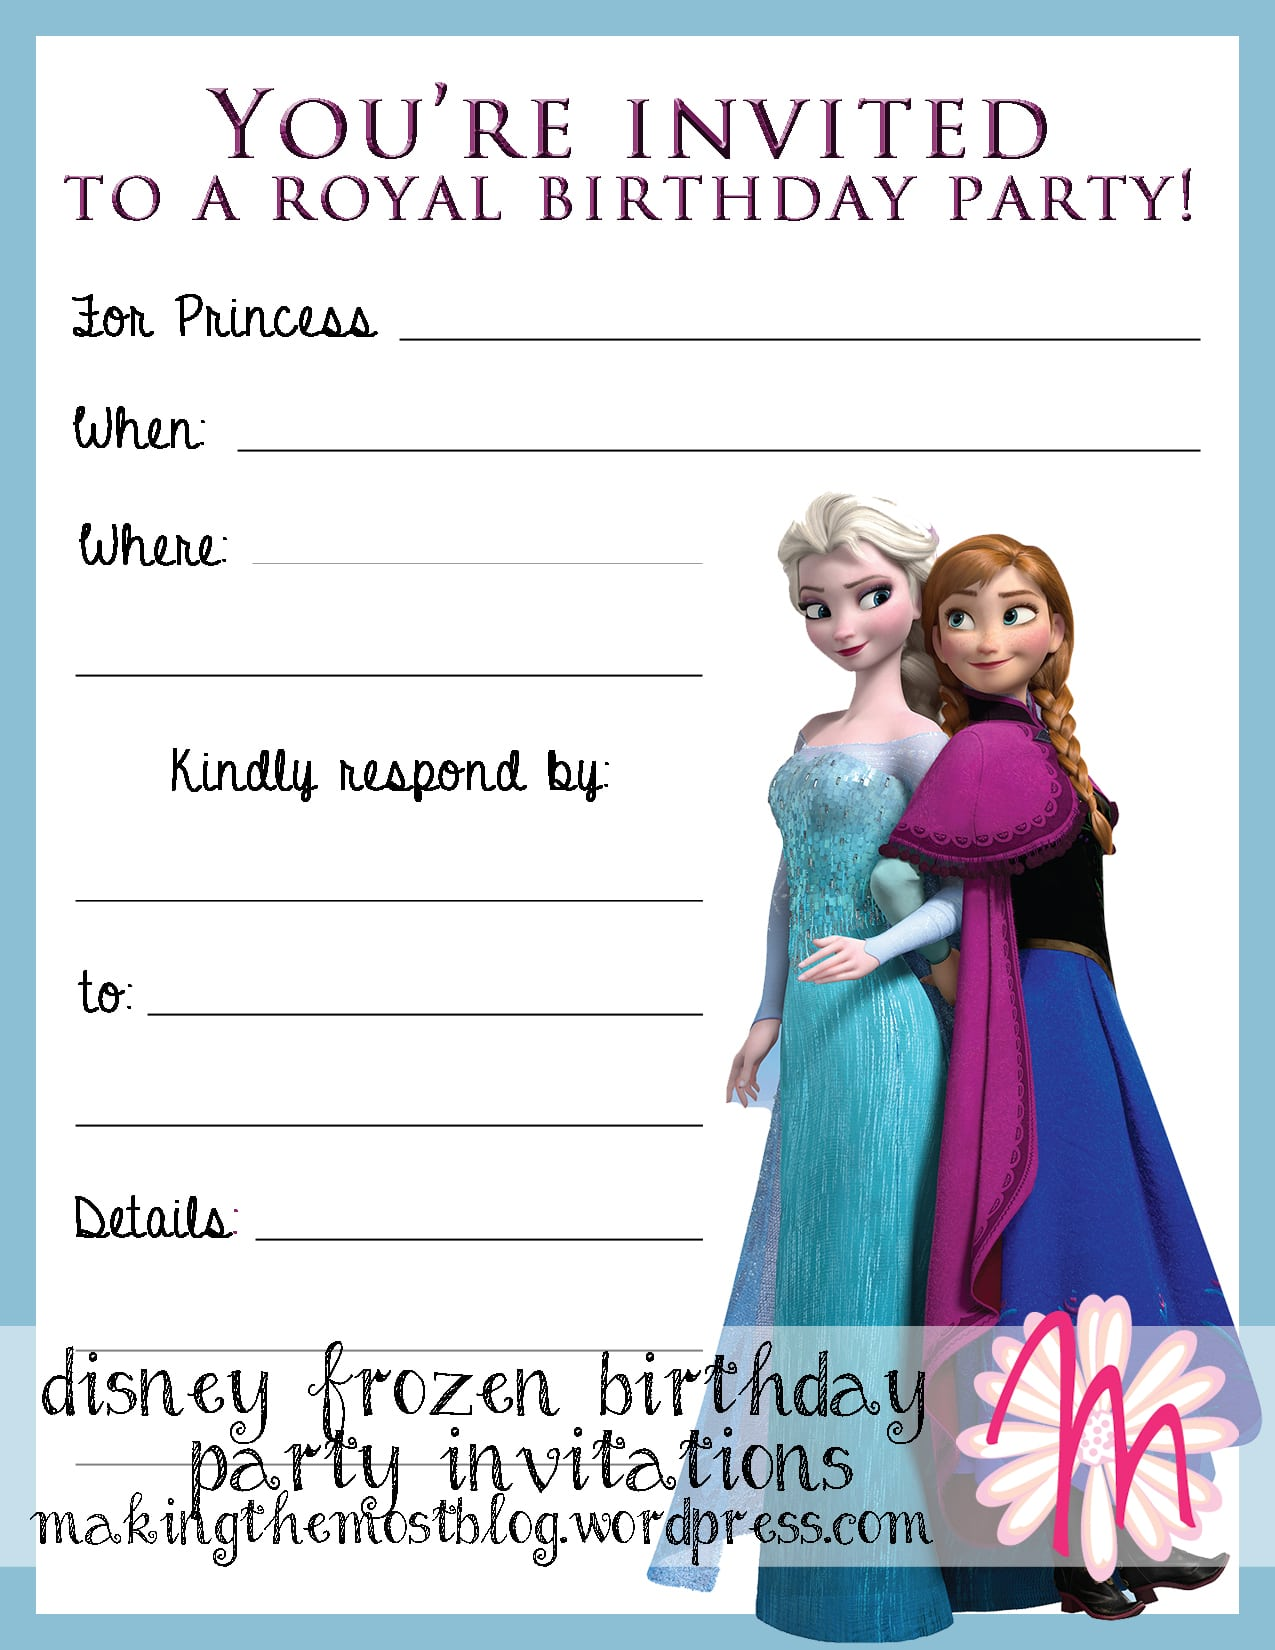 Printable Bday Party Invitations